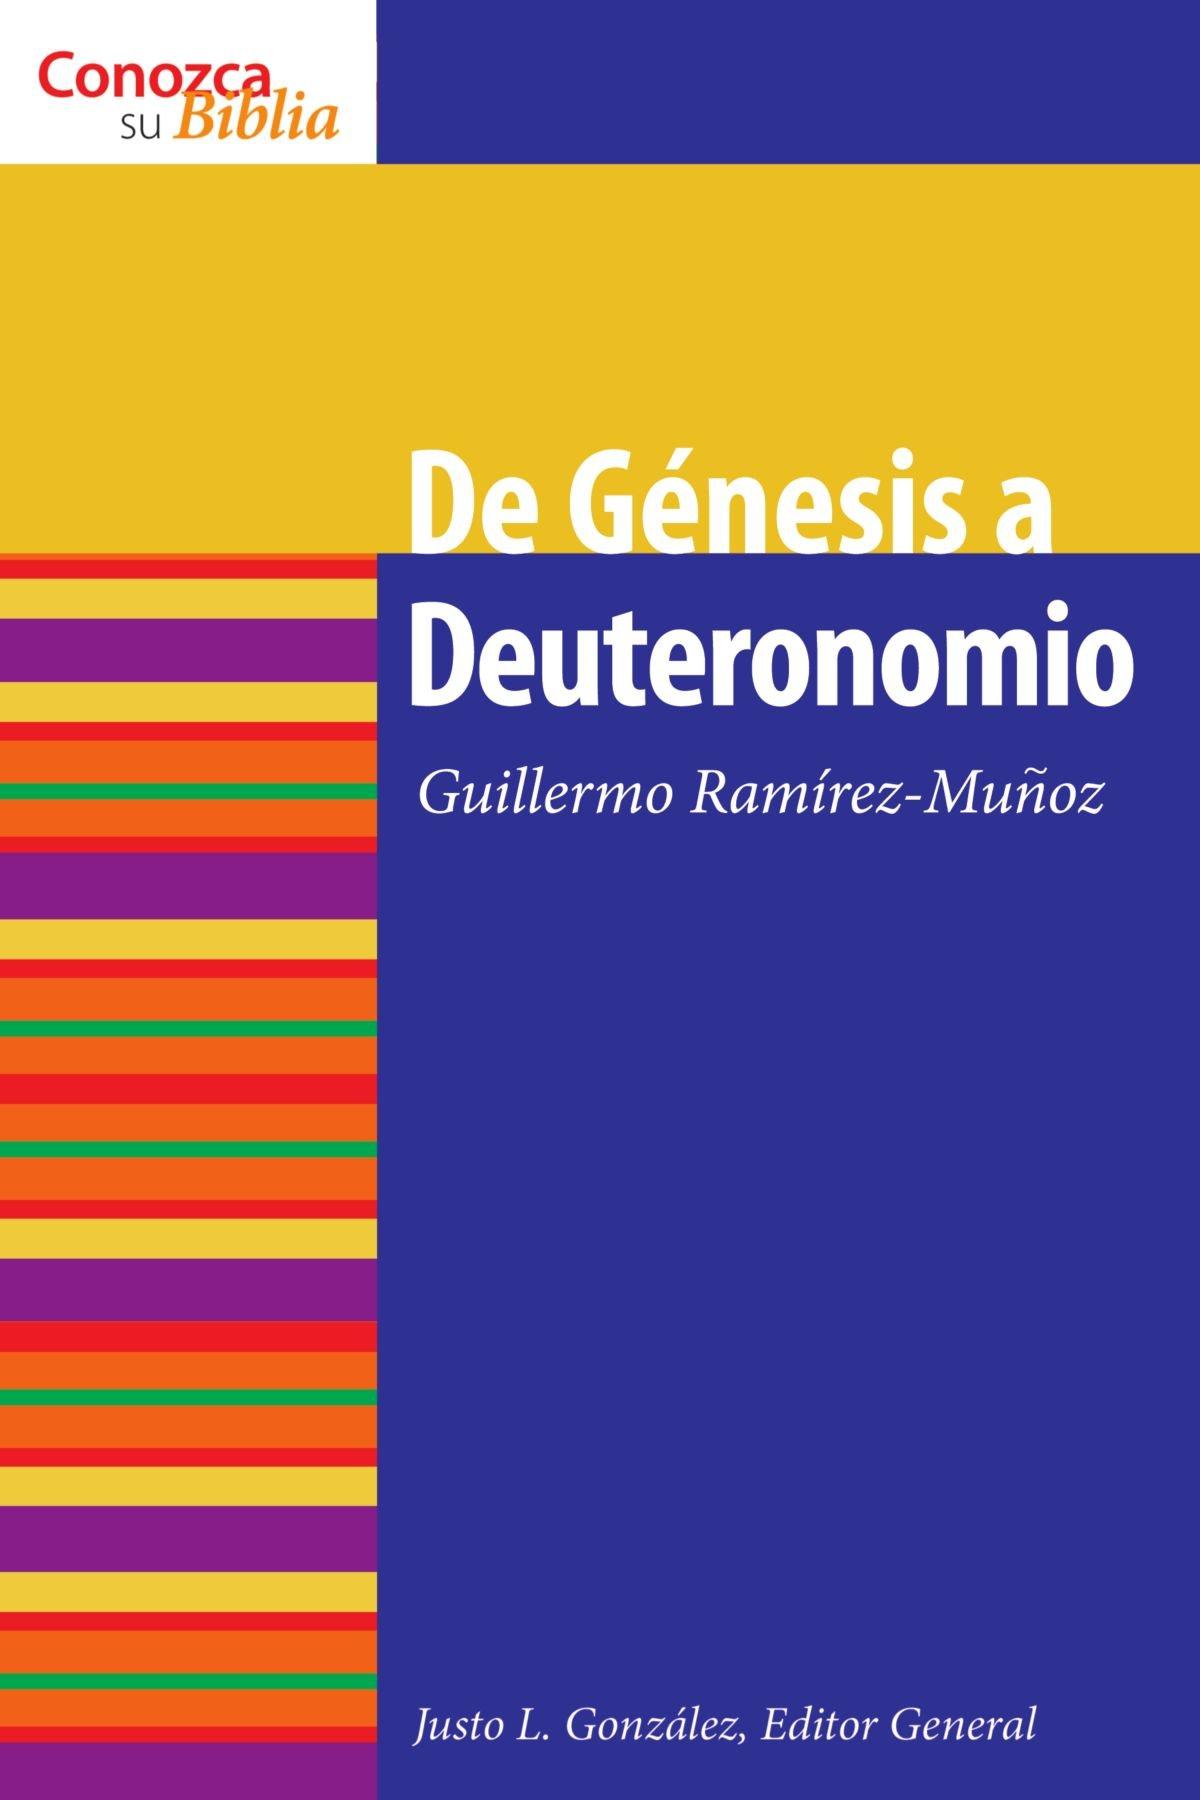 De Genesis A Deuteronomio (conazca Su Biblia) (know Your Bible (spanish))  (spanish Edition): Guillermo Ramirezmunoz: 9780806657769: Amazon: Books